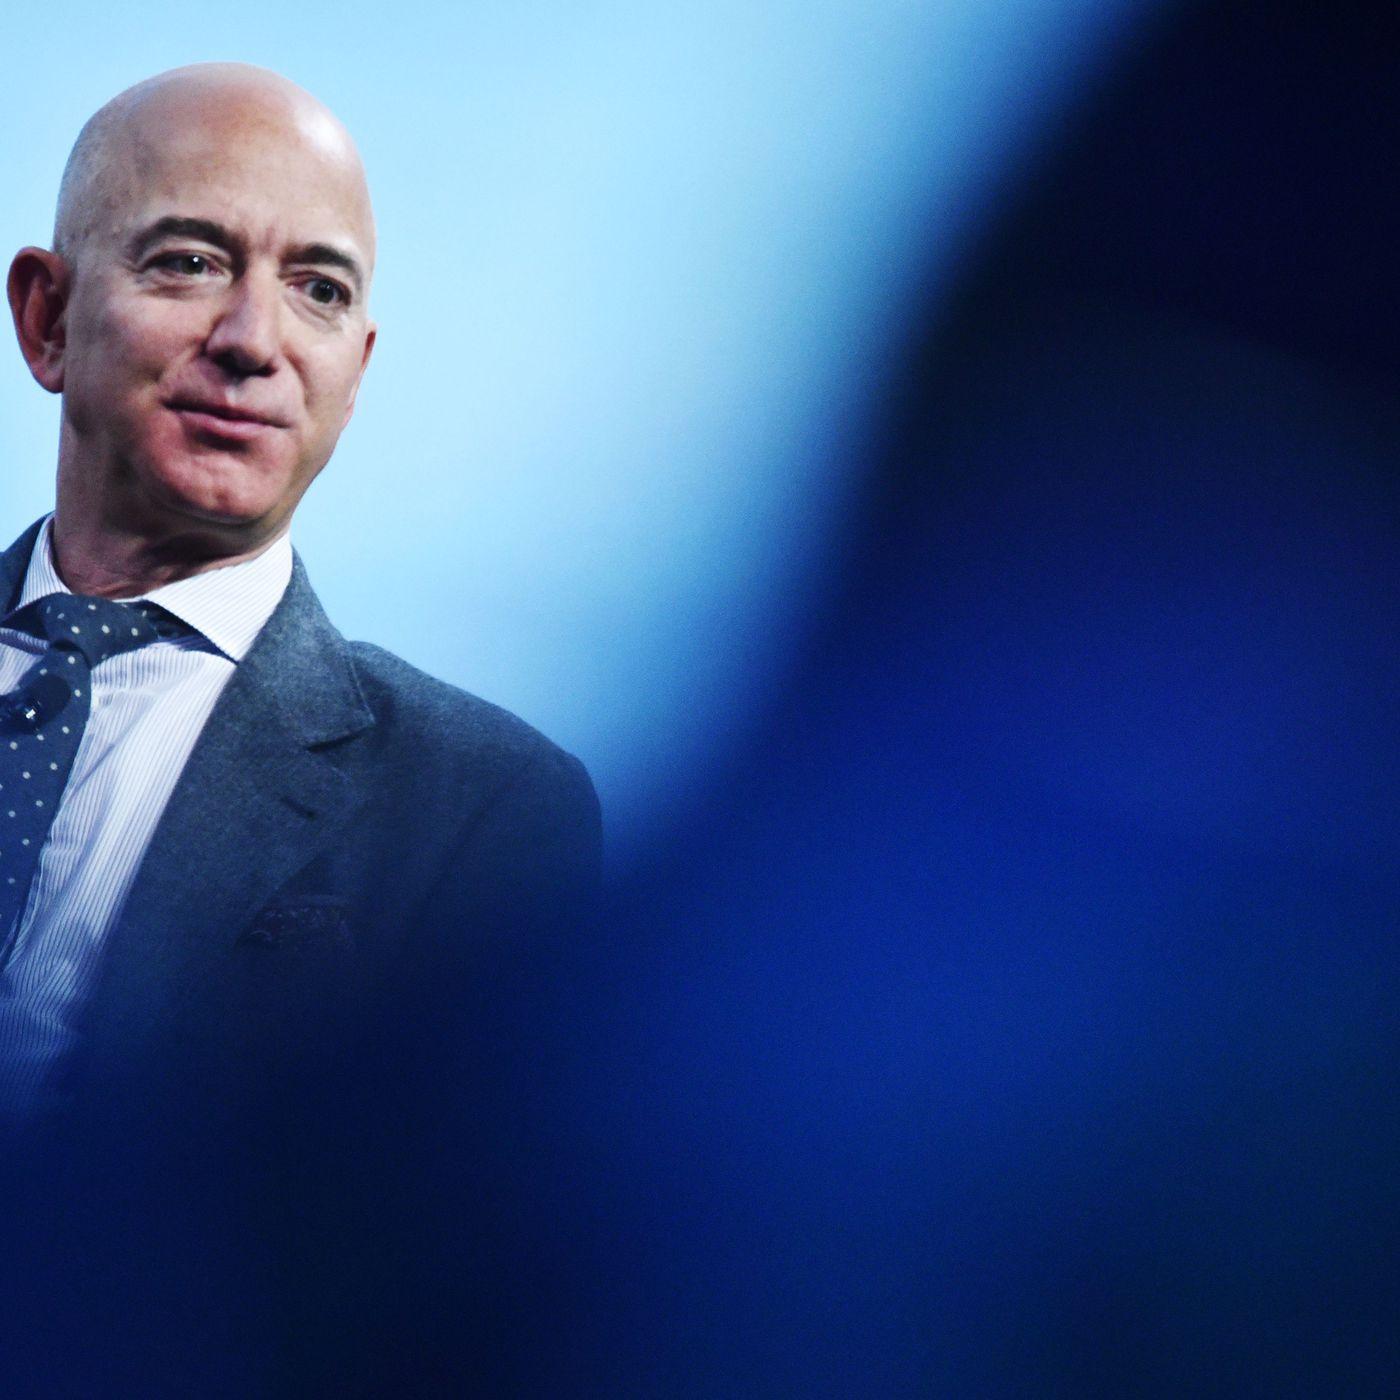 Jeff Bezos Donates 10 Billion To Fight Climate Change Vox